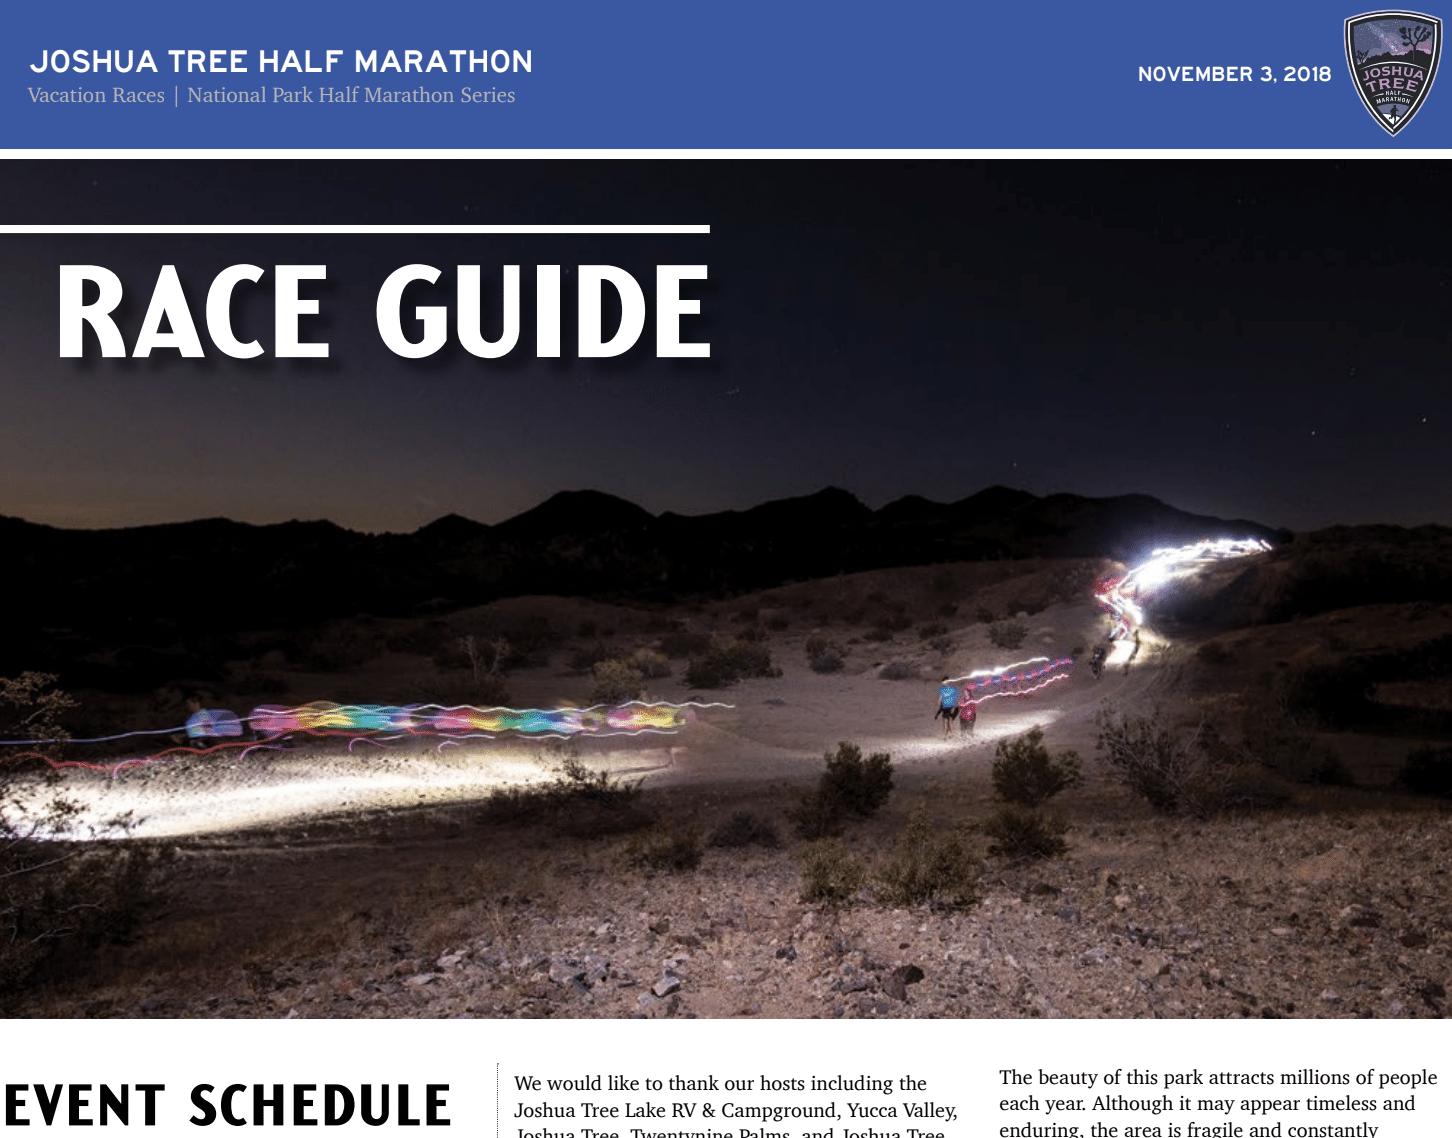 2018 Joshua Tree Half Marathon Race Guide Now Available 187 Vacation Races